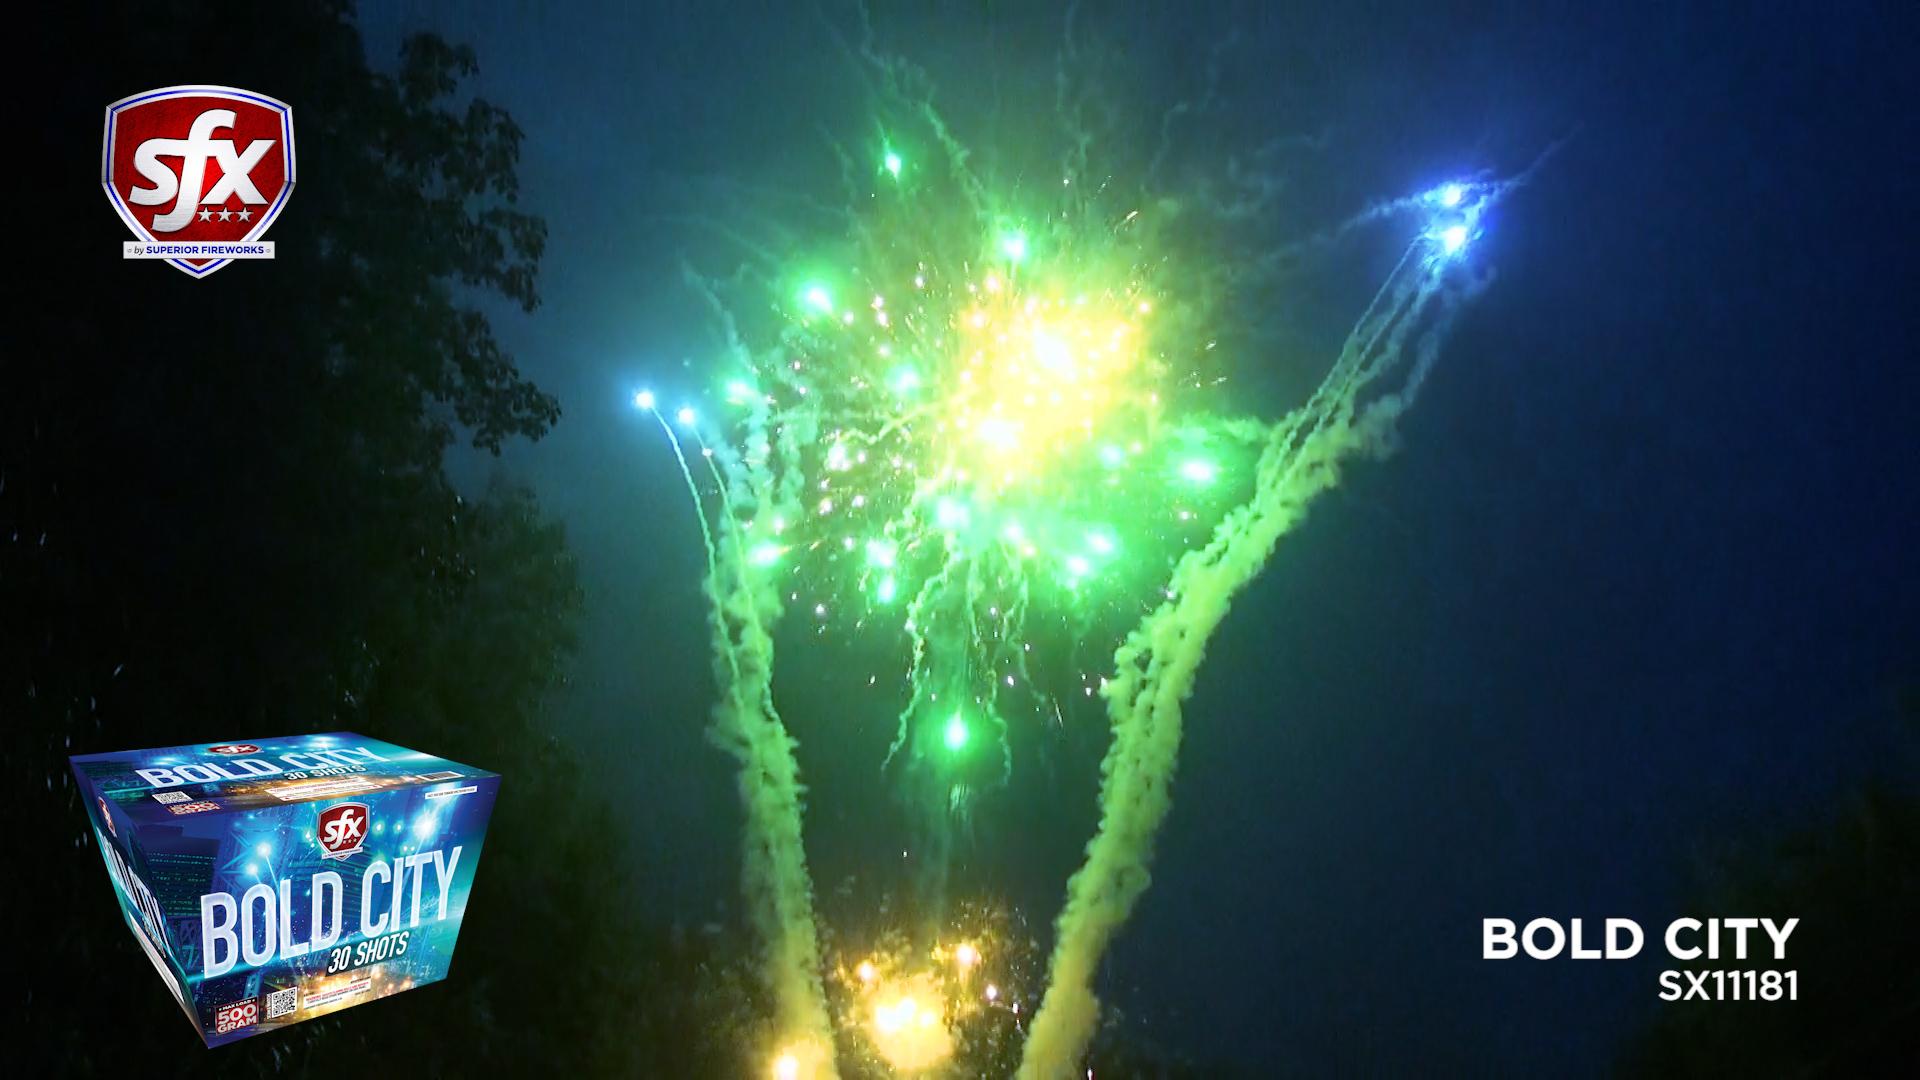 Top 10 Fireworks of 2018 - Superior Fireworks